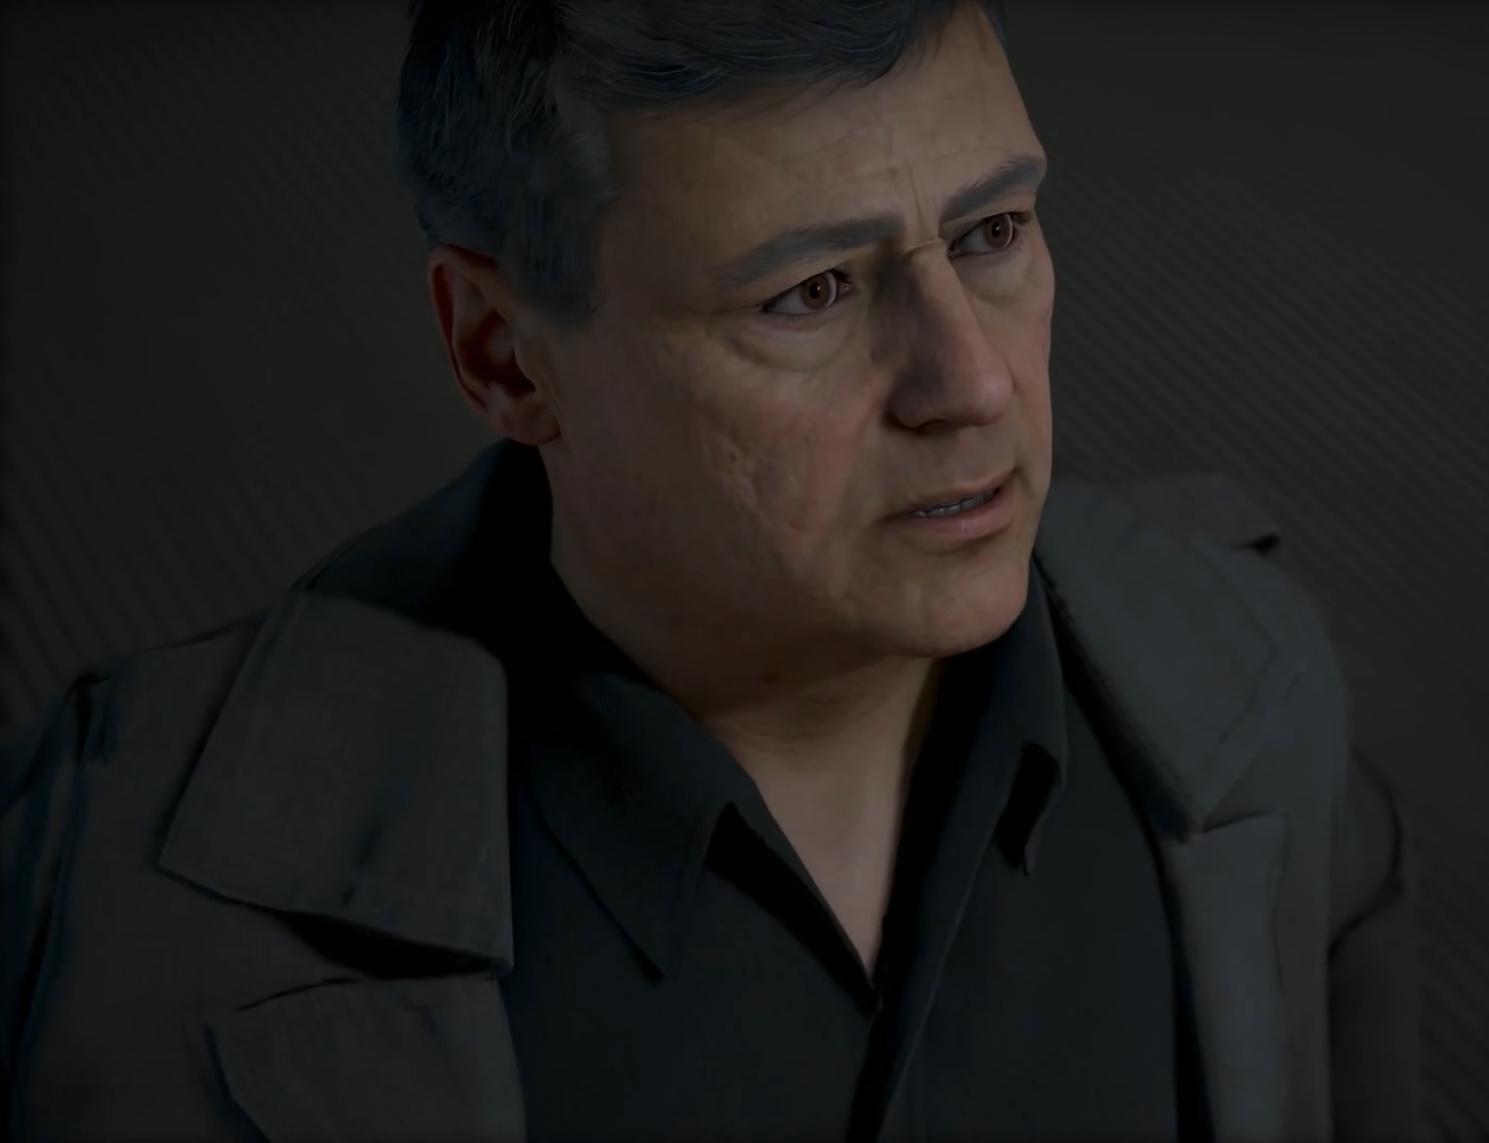 Ian Blake